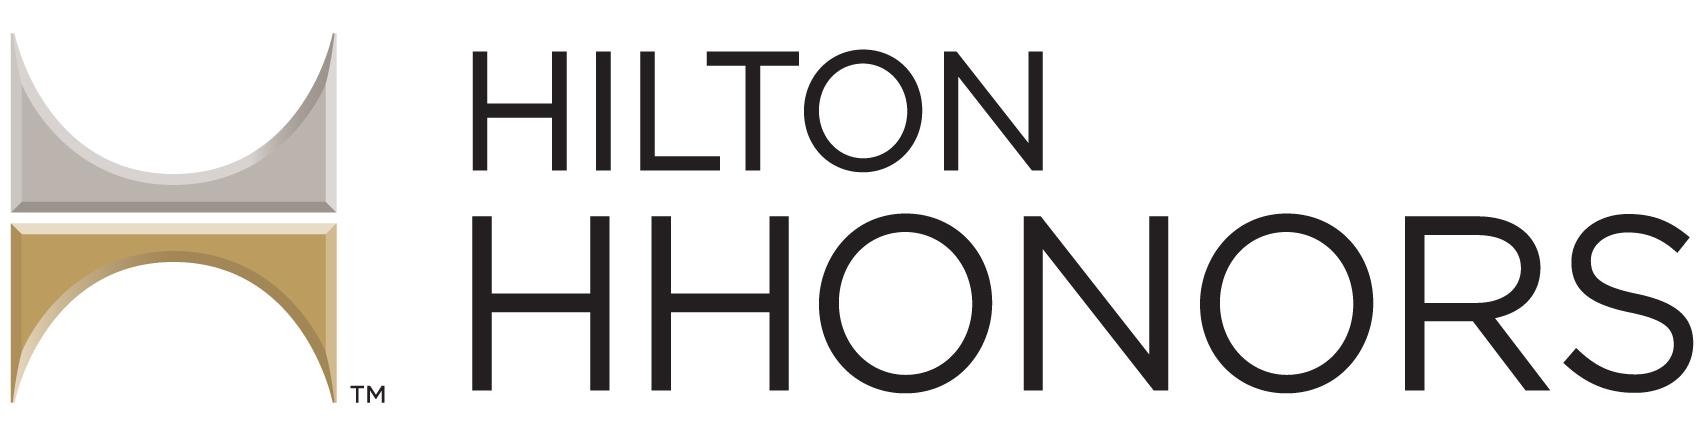 Hilton Hhonors Logo Viajero Millero